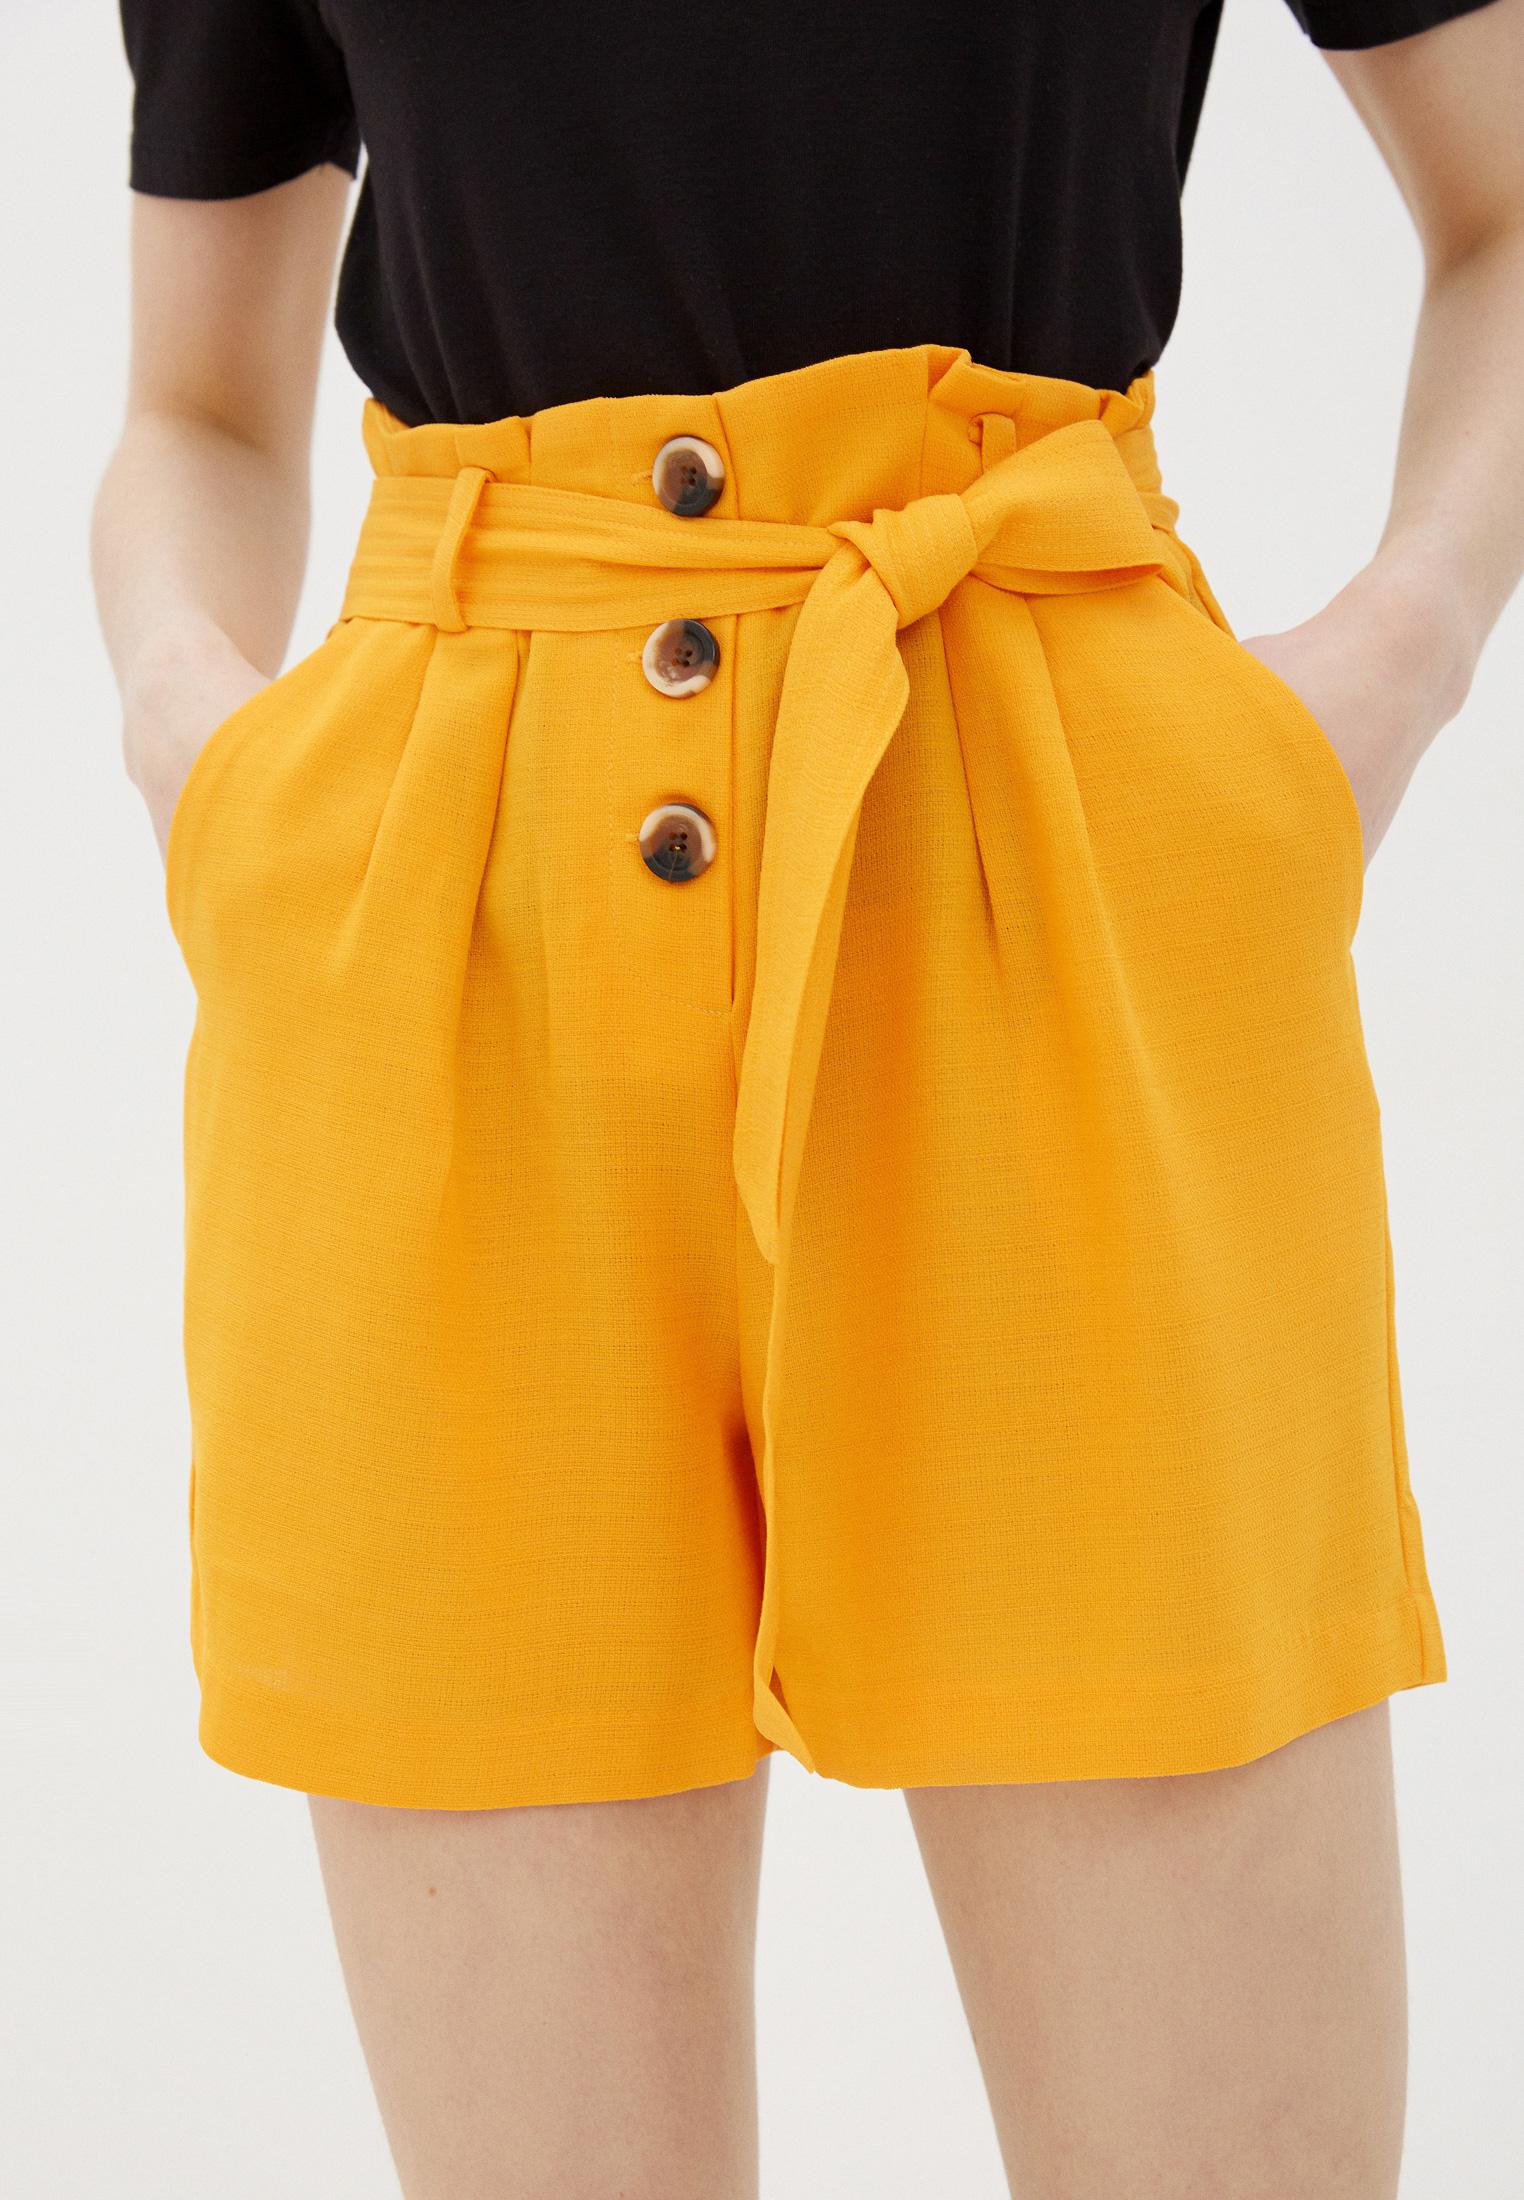 желтые шорты женские фото видят мир